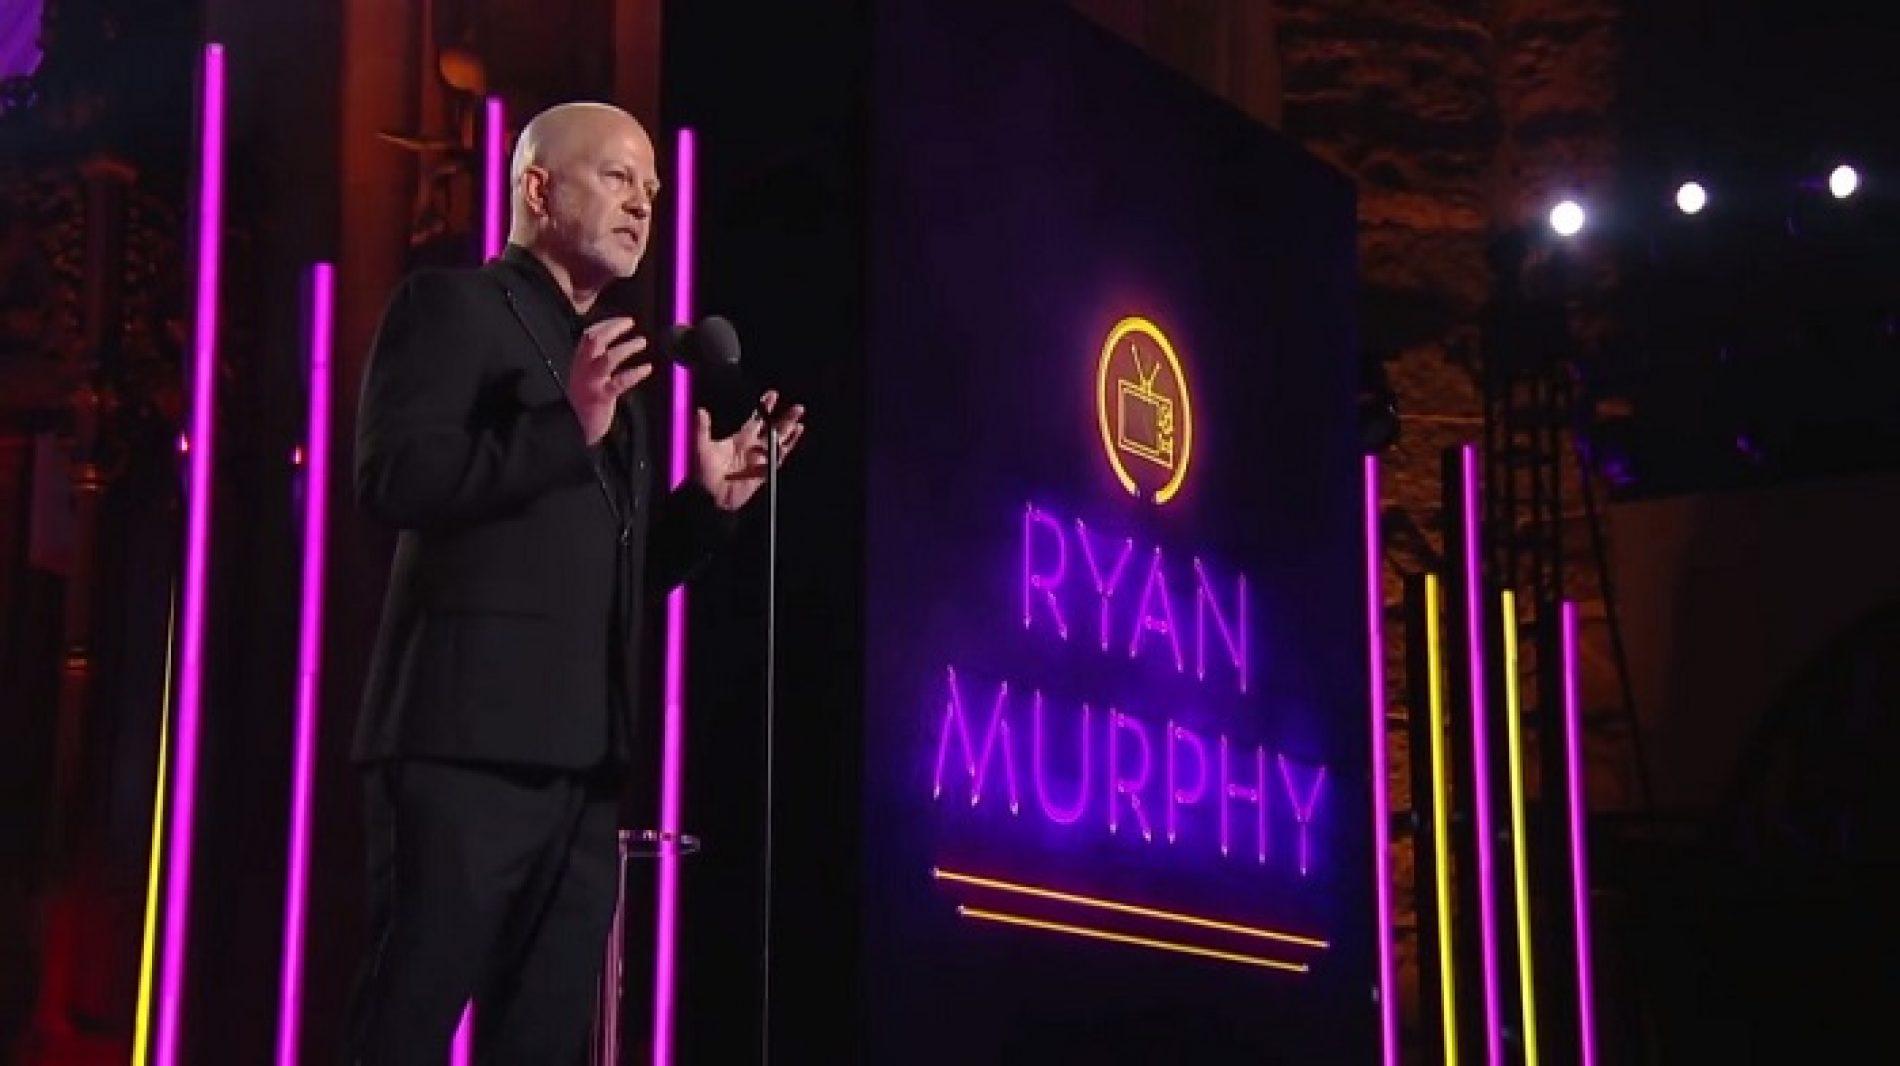 Ryan Murphy accepts Trailblazer Honor with inspiring speech